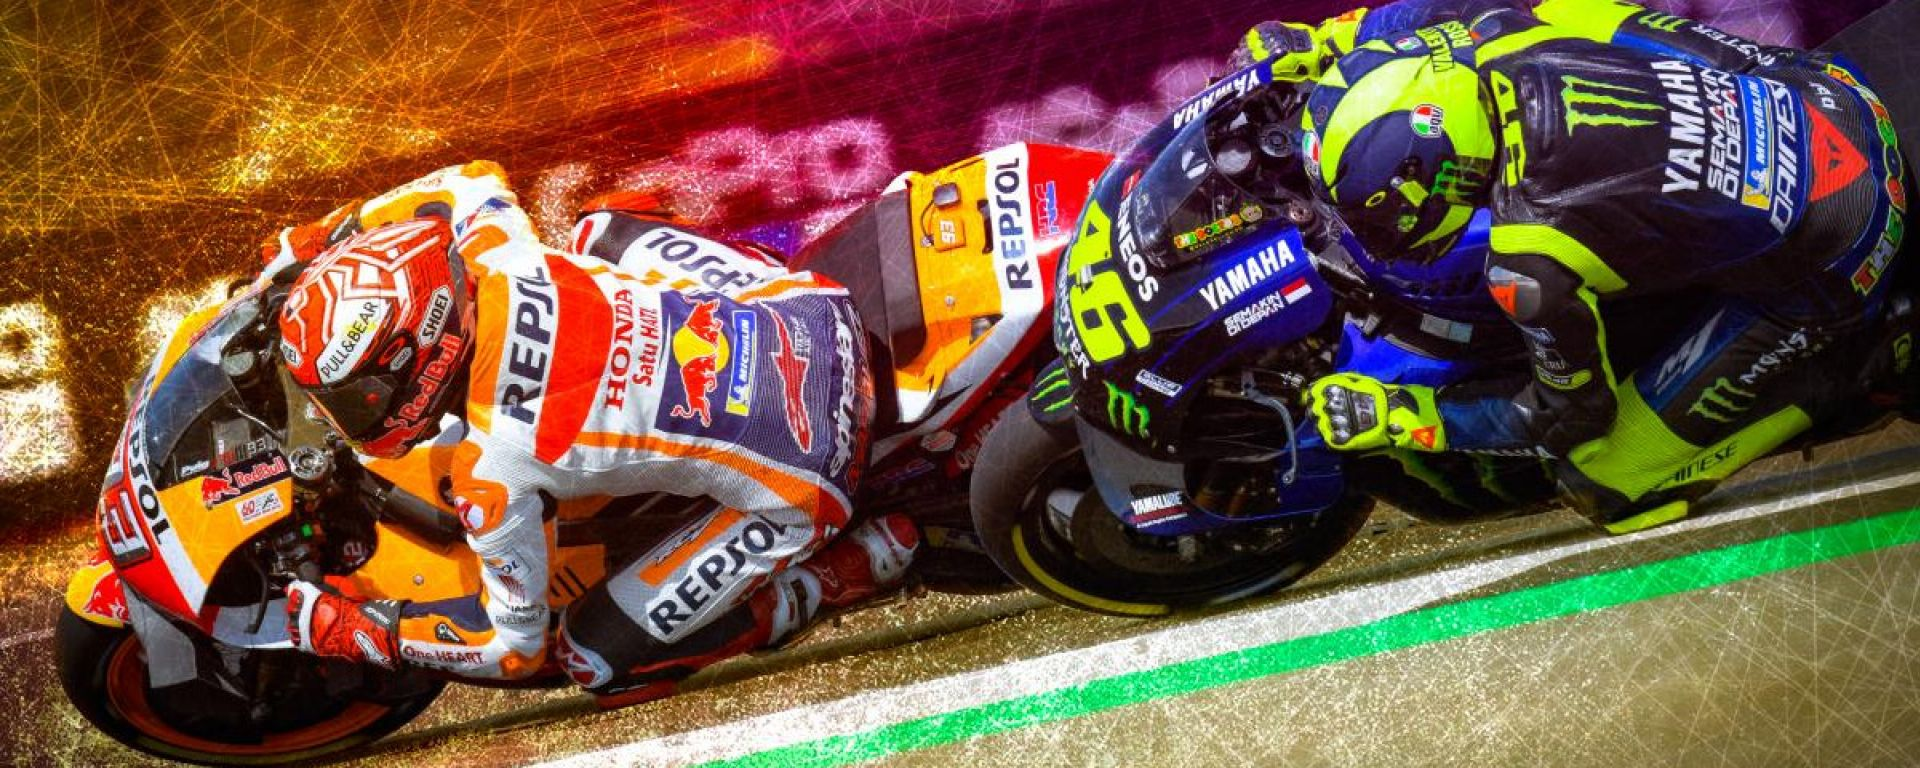 MotoGP 2019, Marc Marquez (Honda) vs Valentino Rossi (Yamaha)